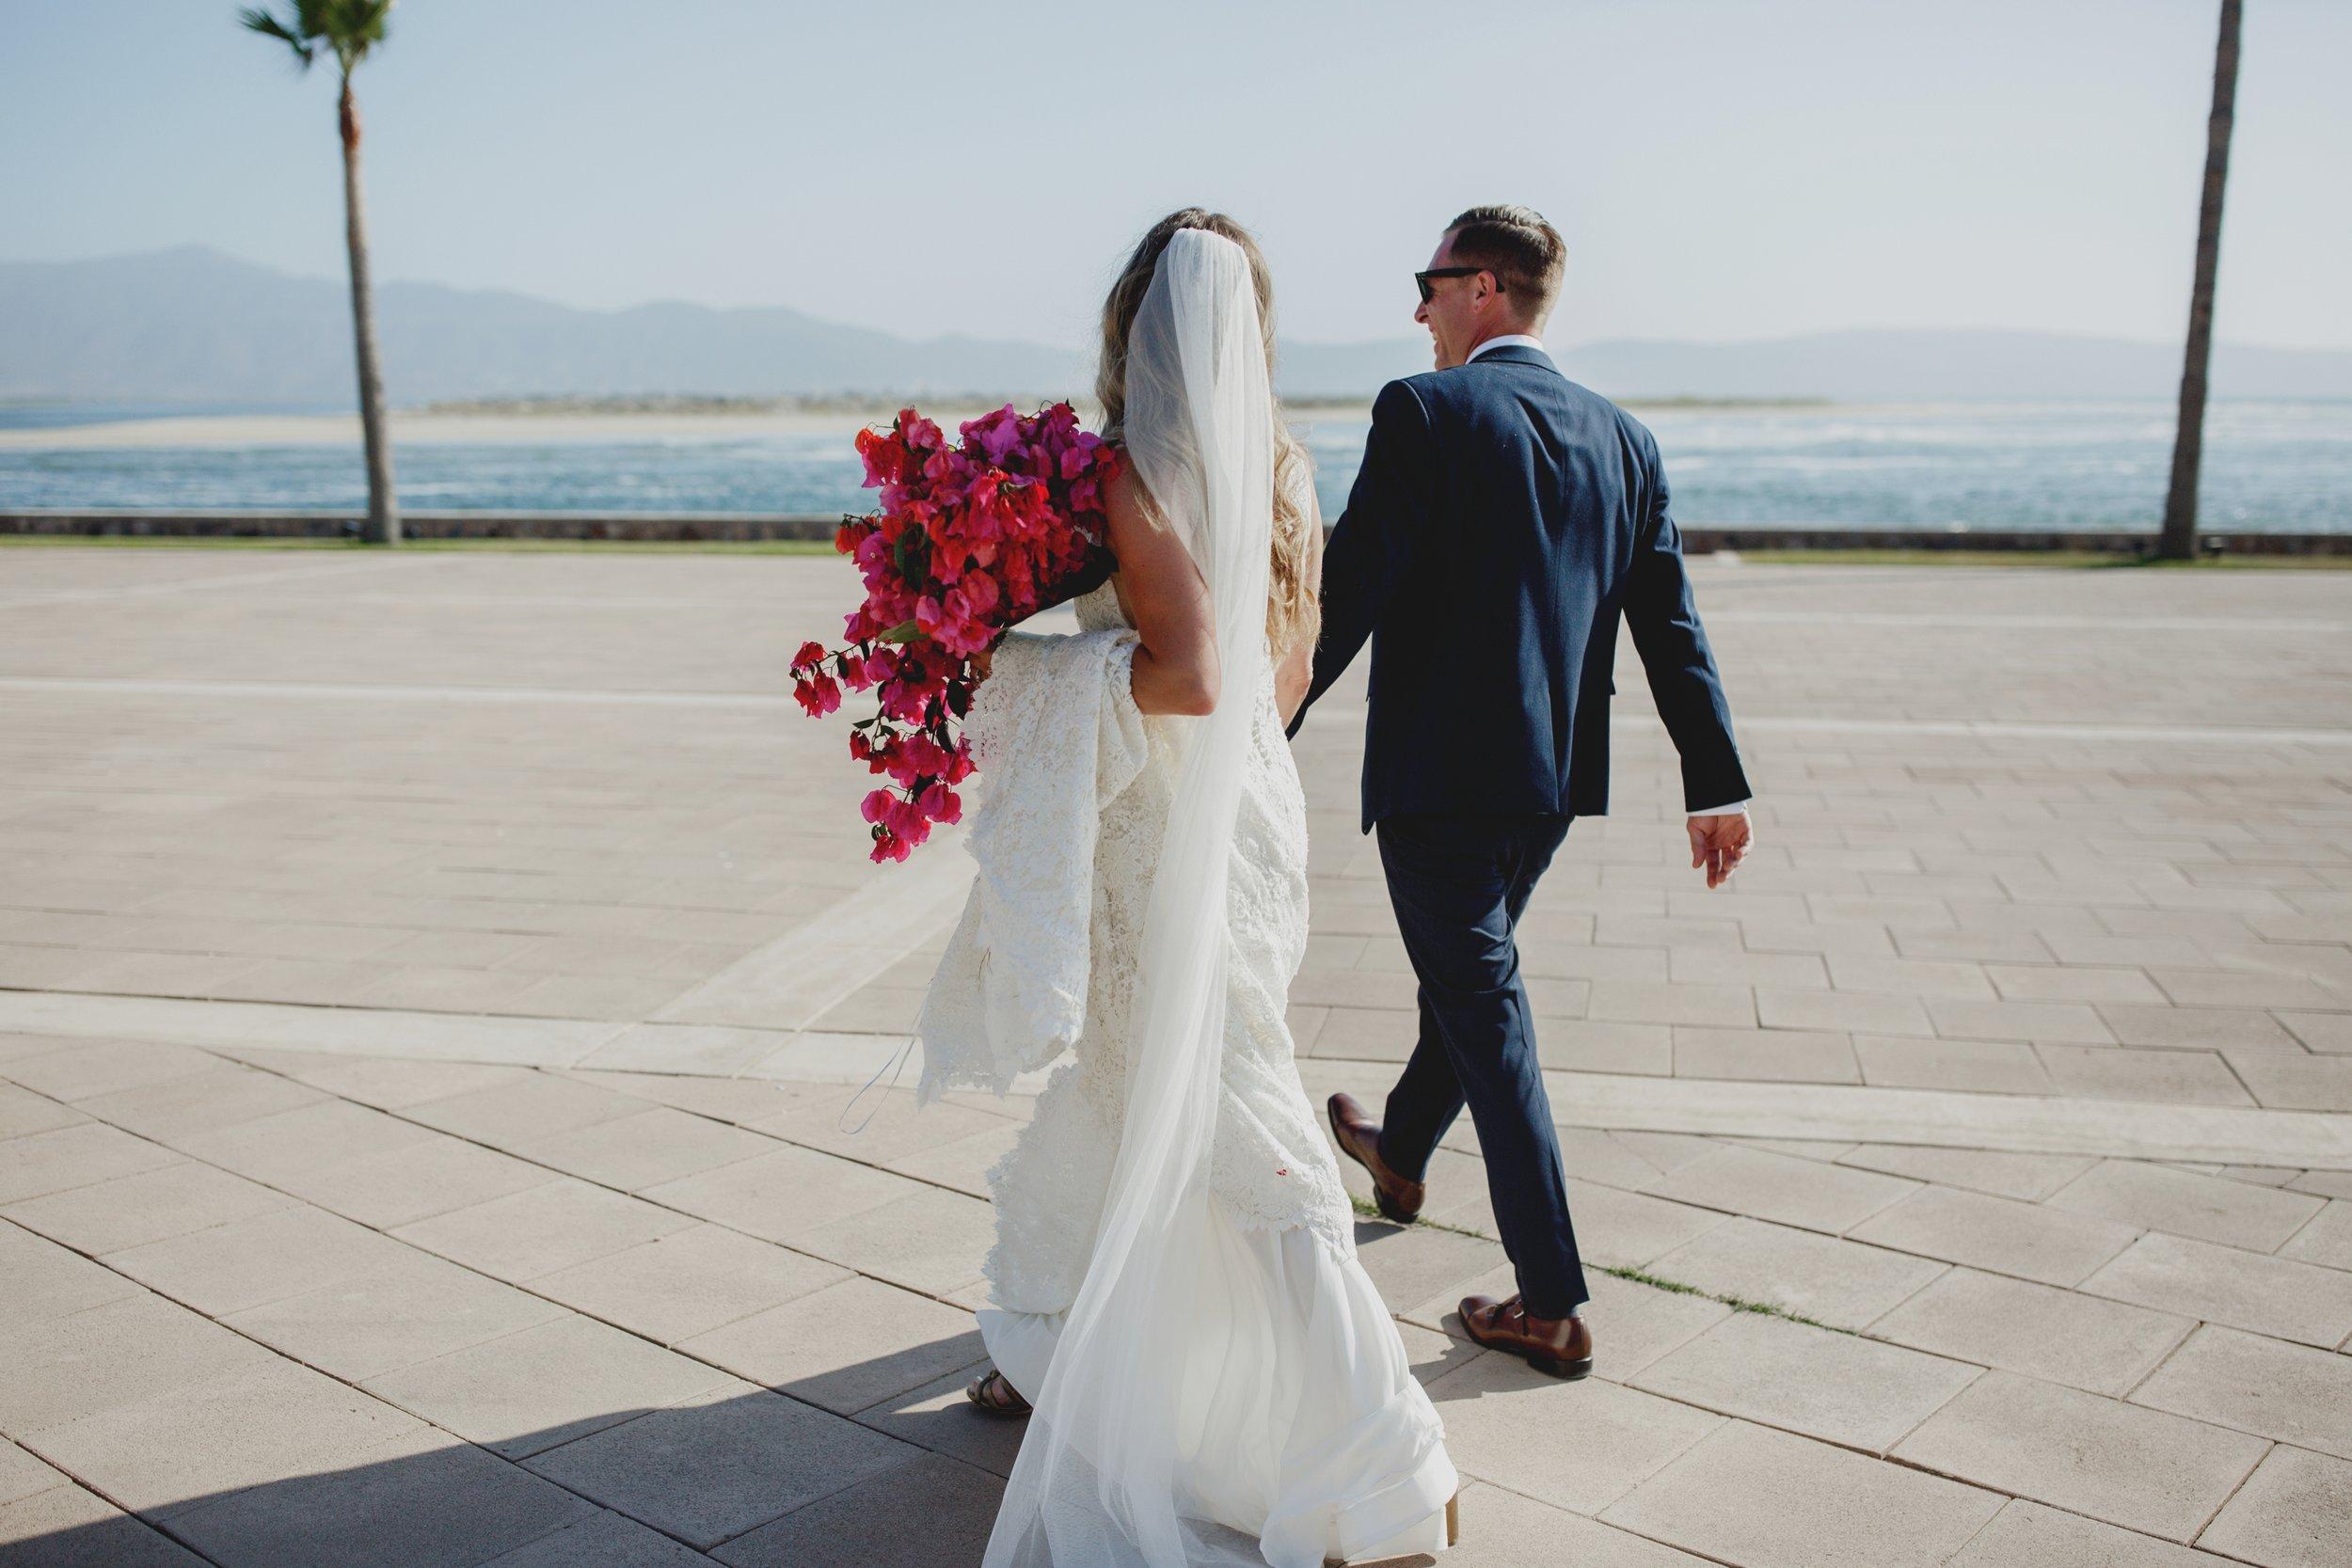 amandavanvels_ensenada_mexico_wedding_054.jpg